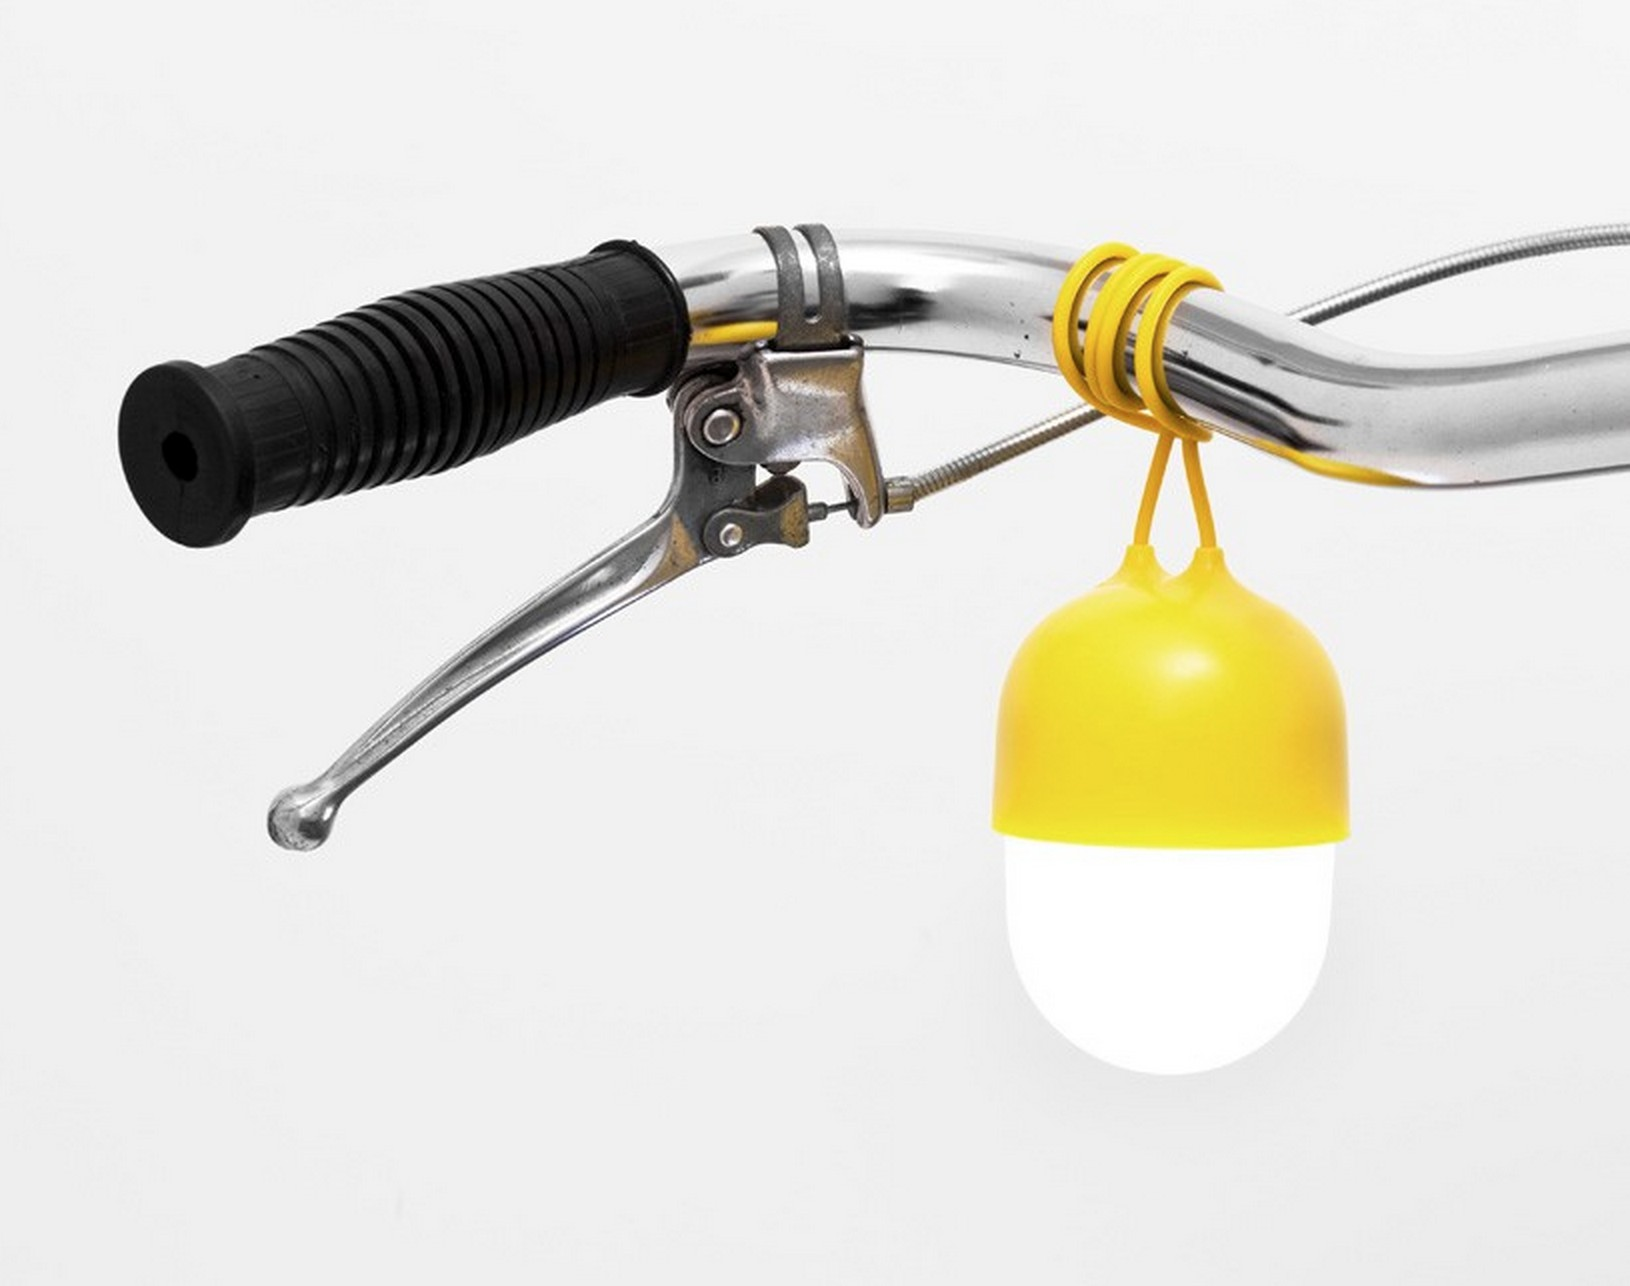 lampe portable par ionna vautrin blog d co design. Black Bedroom Furniture Sets. Home Design Ideas